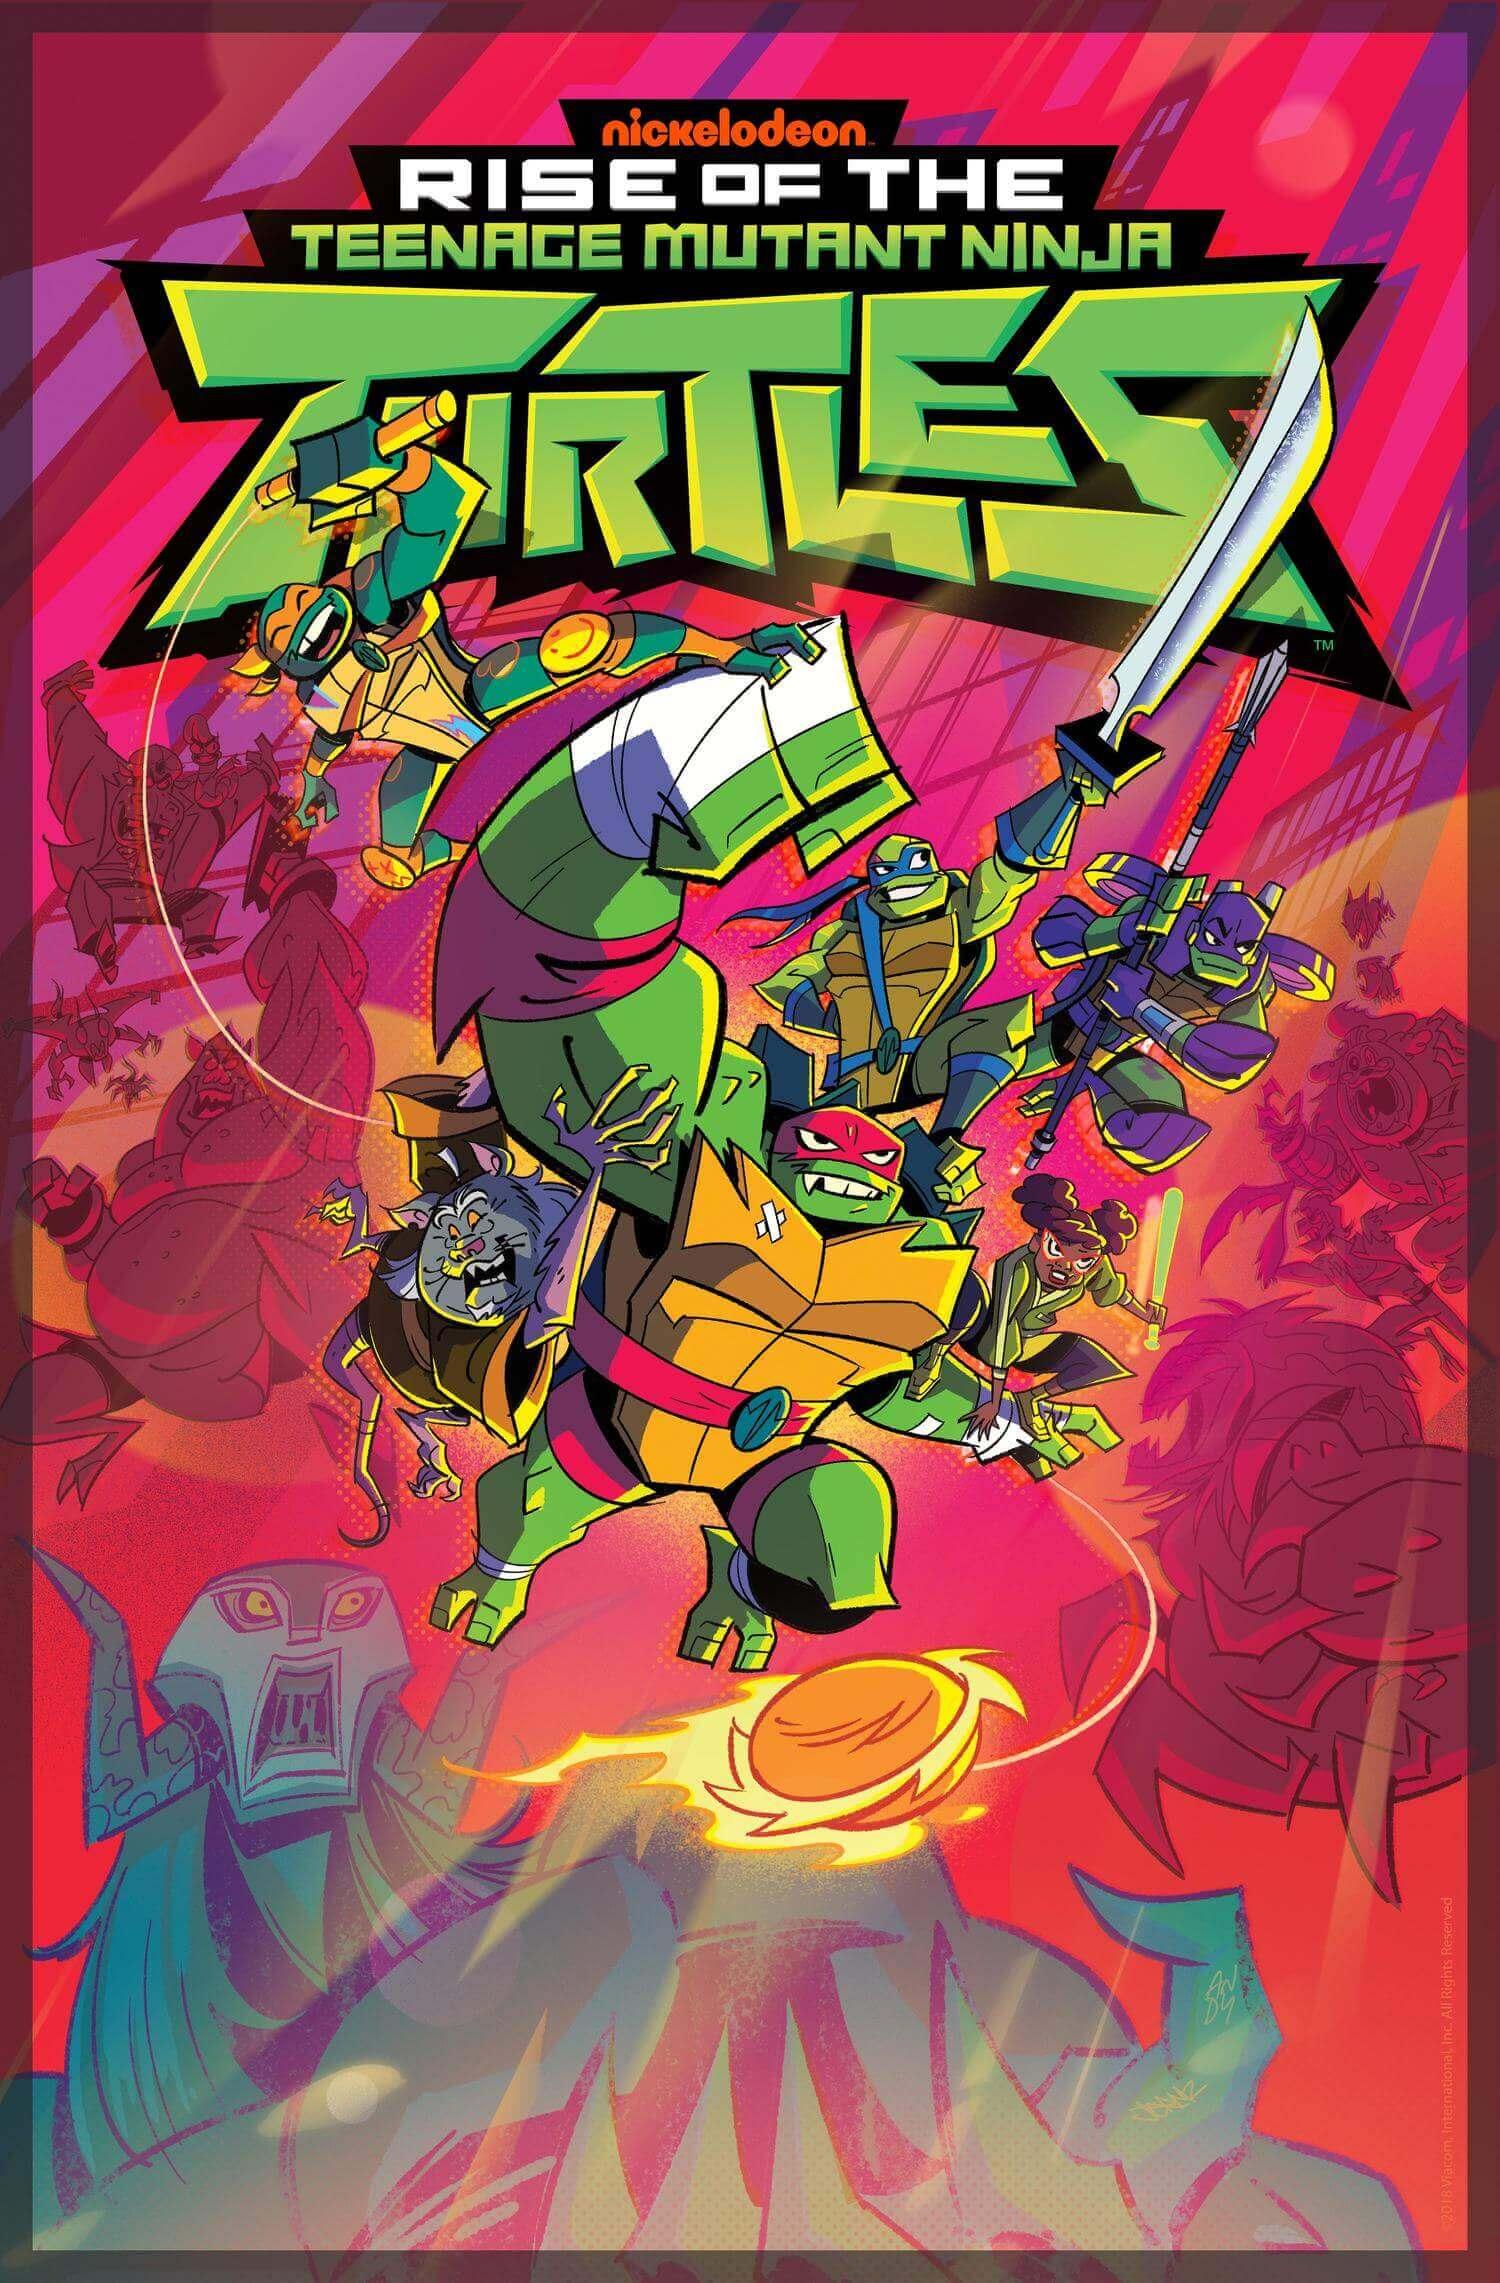 Rise of the Teenage Mutant Ninja Turtles. Foto: Nickelodeon